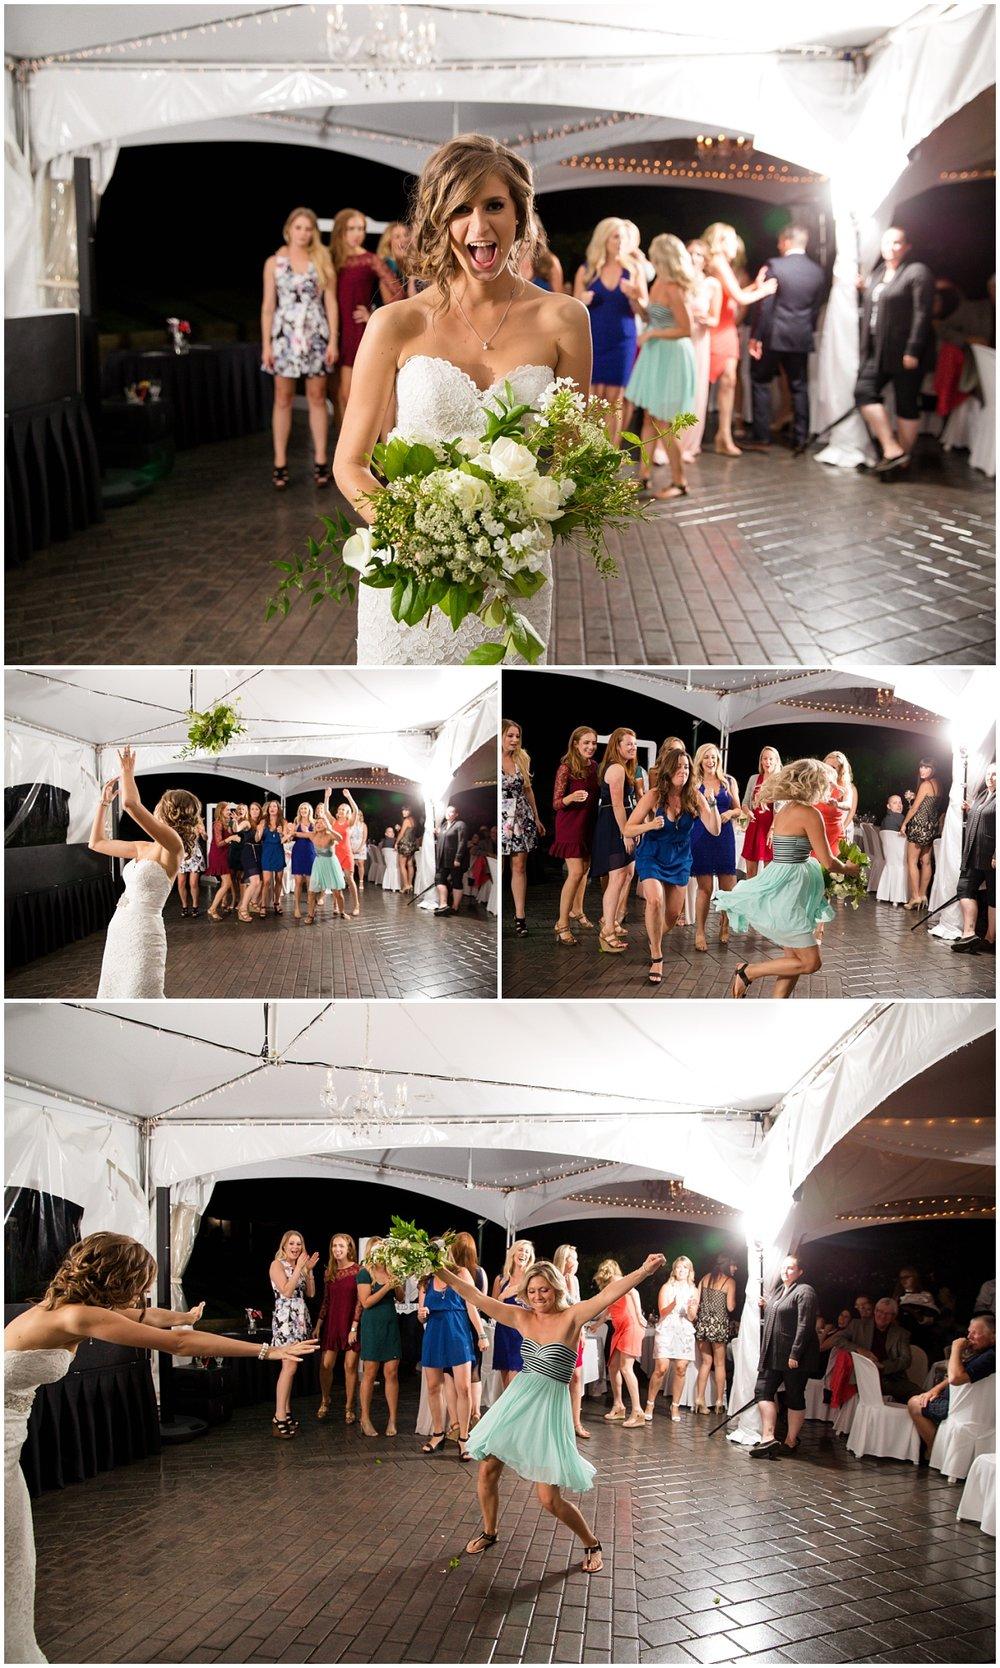 Amazing Day Photography - Redwoods Golf Course Wedding - Amanda and Dustin - Langley Wedding Photographer  (35).jpg